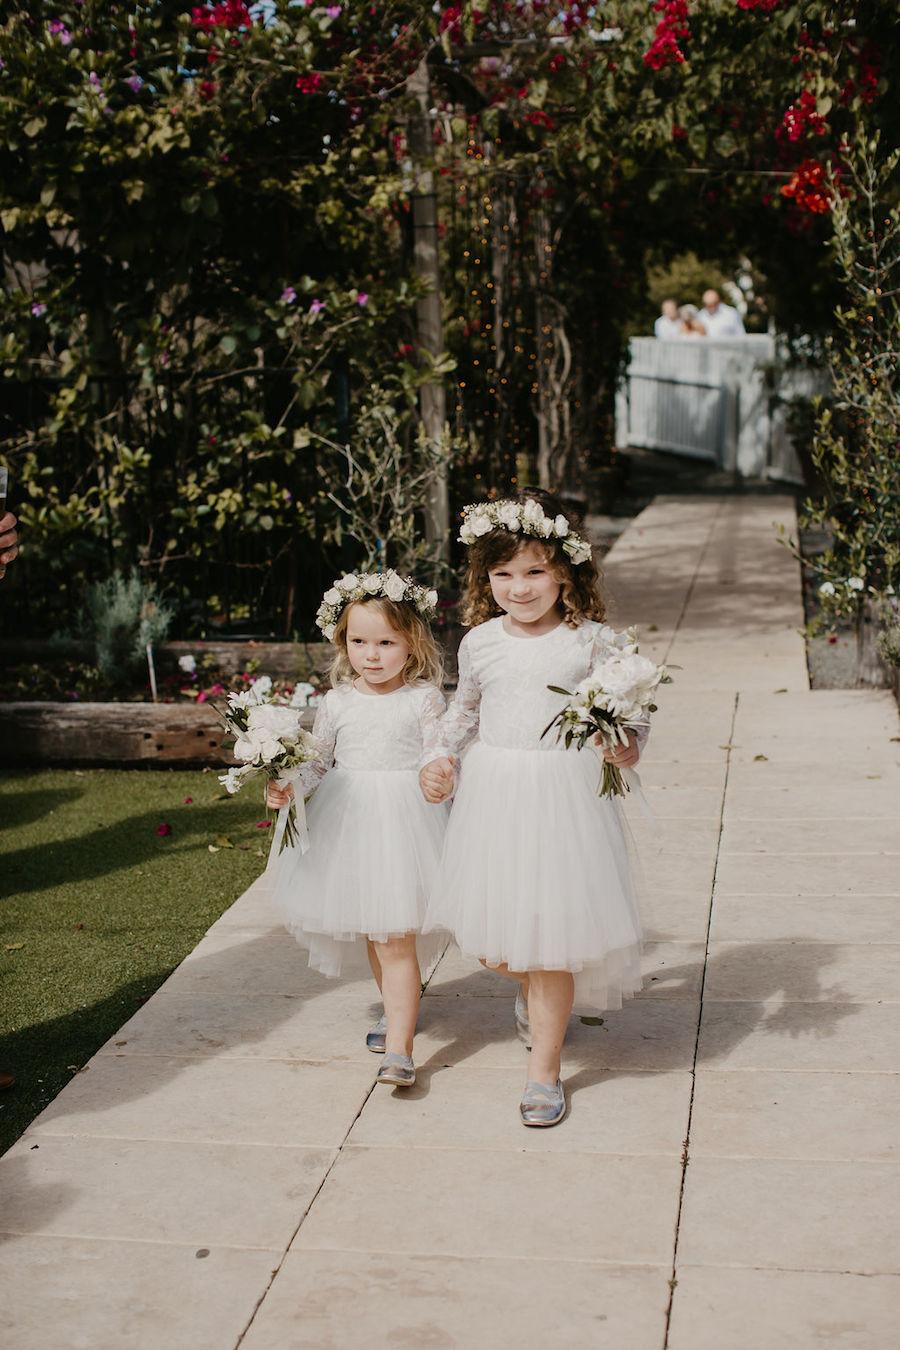 tweed-coast-weddings-wedding-venue-osteria-casuarina-ceremony-reception-5D3A6886.jpg